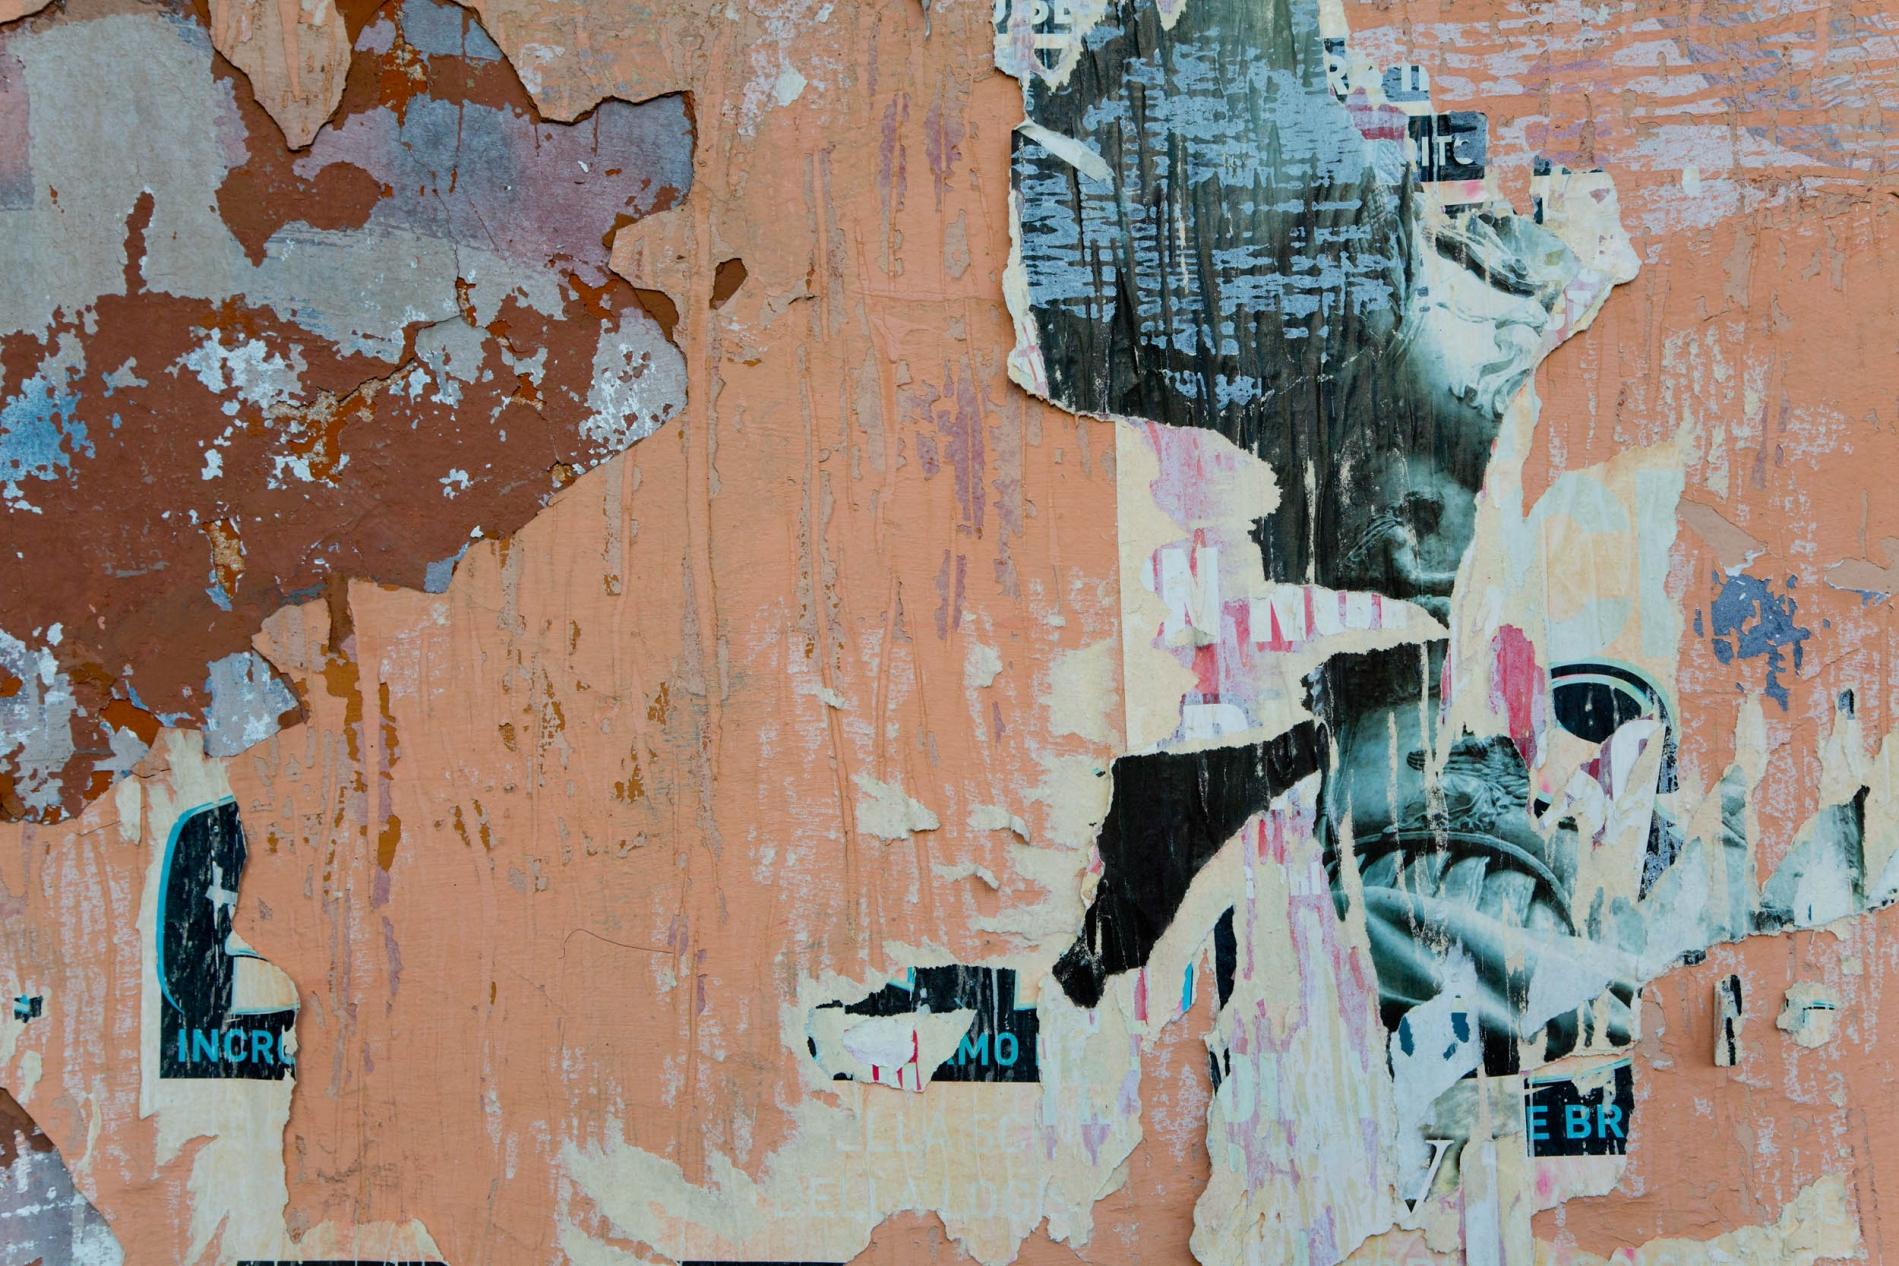 Wallpaper05